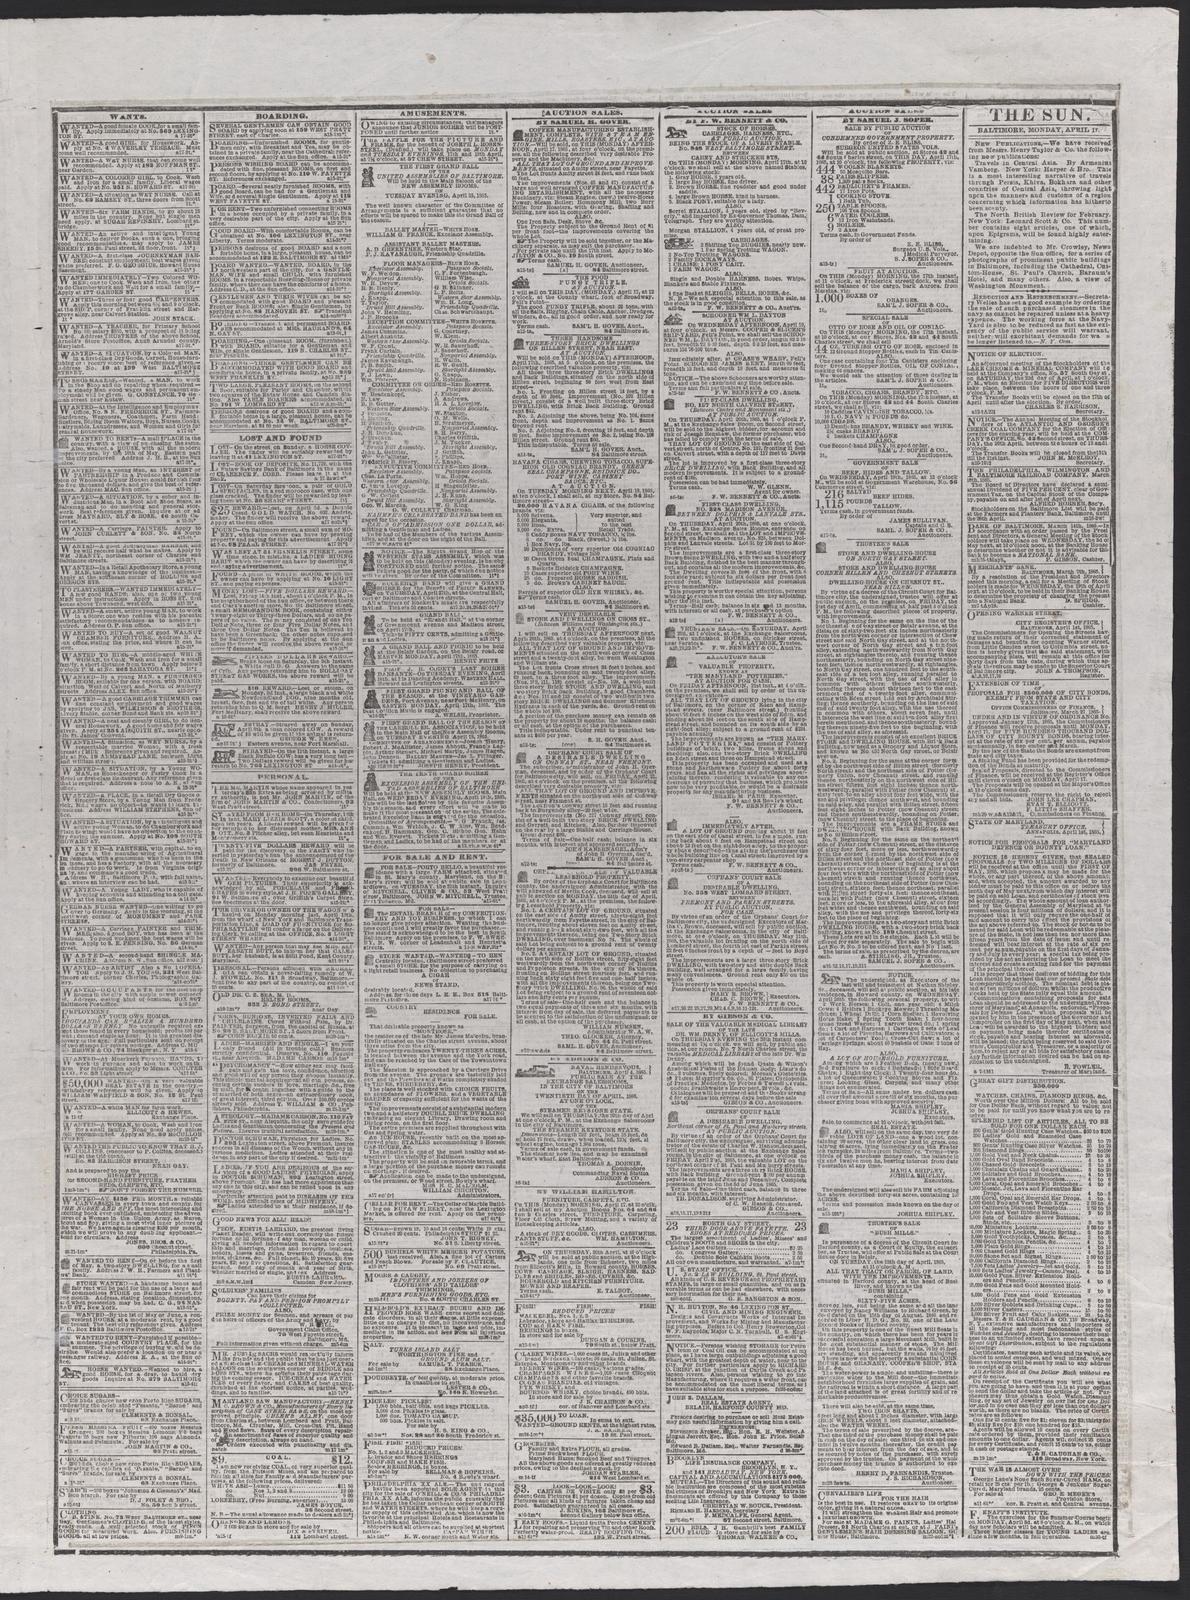 The Sun, [newspaper]. April 17th, 1865.